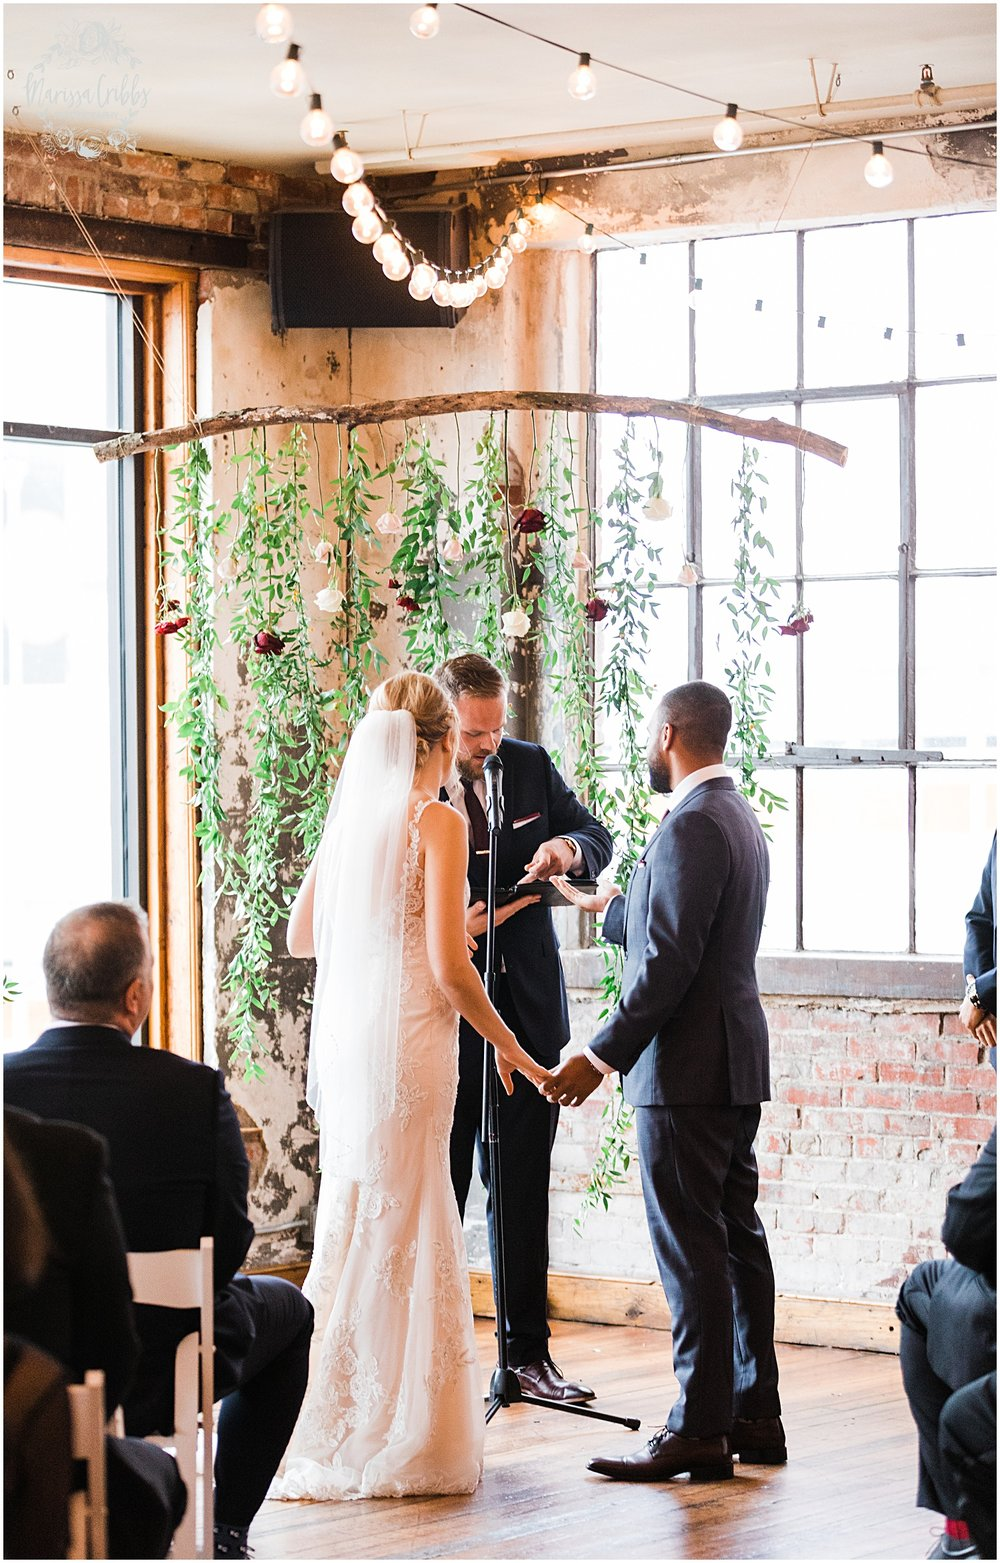 BAUER WEDDING   KELSEA & JUSTIN   MARISSA CRIBBS PHOTOGRAPHY_6557.jpg